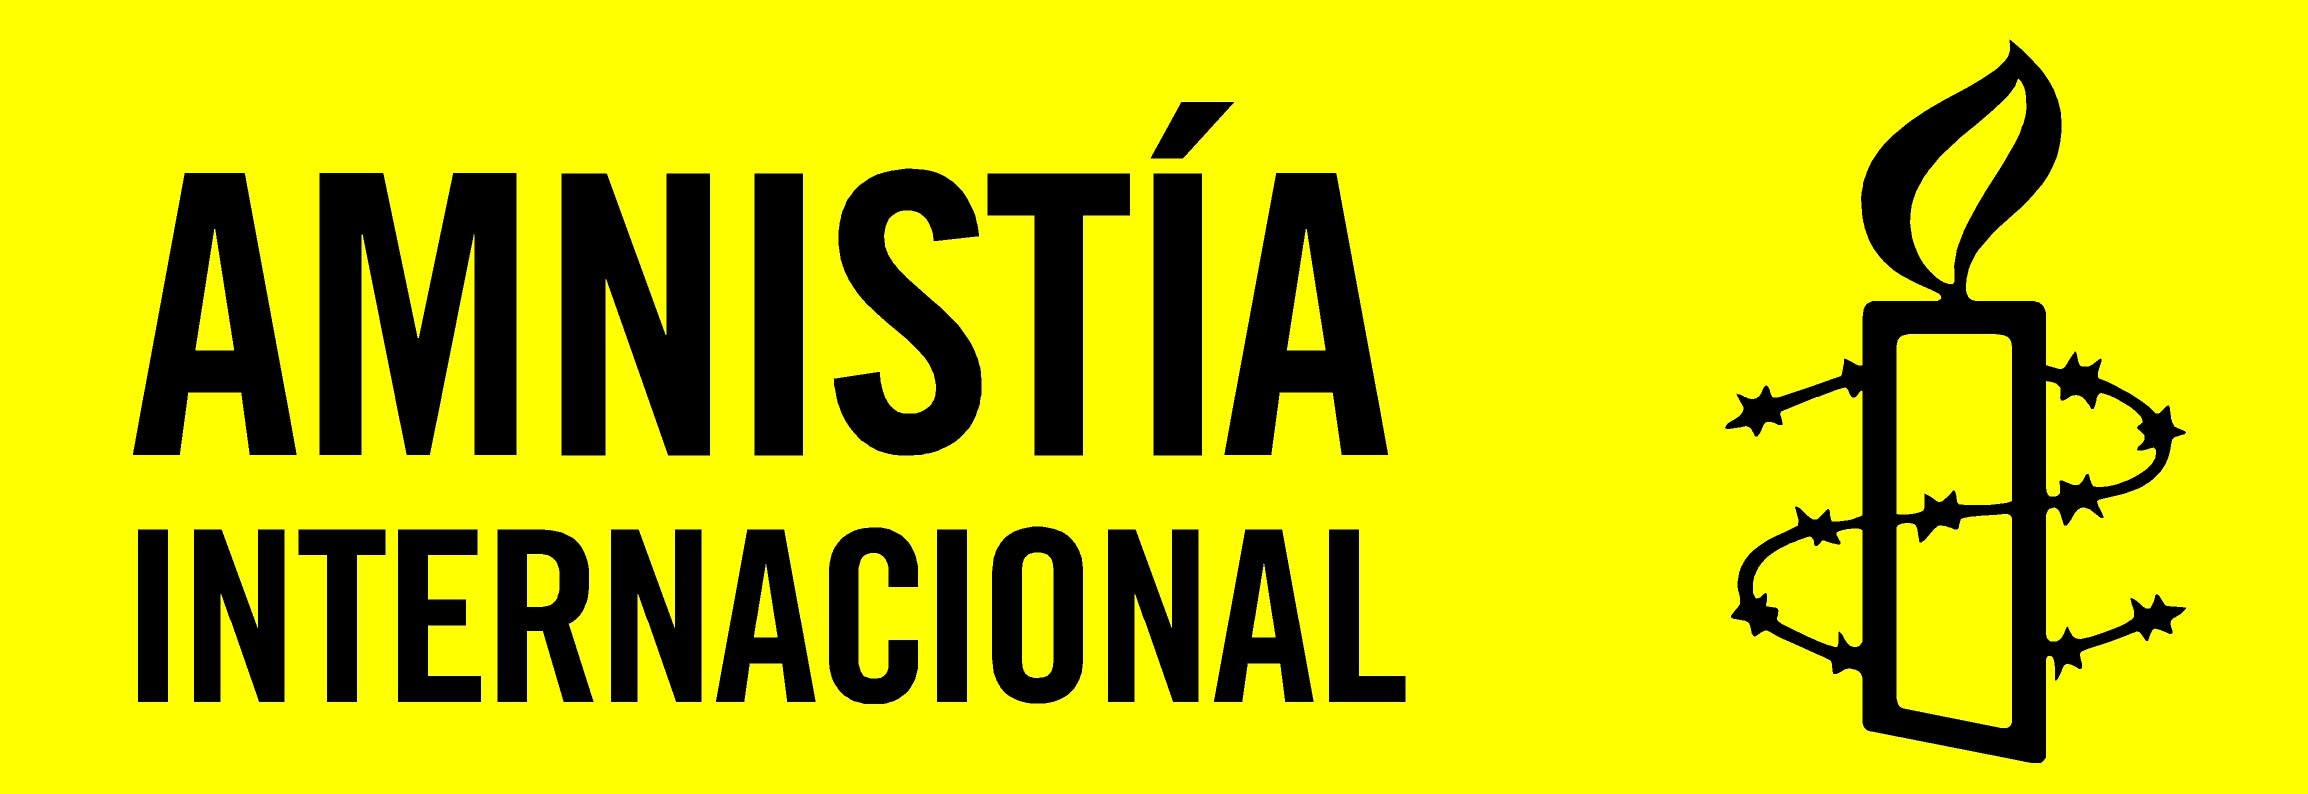 amnistia-internacional_web